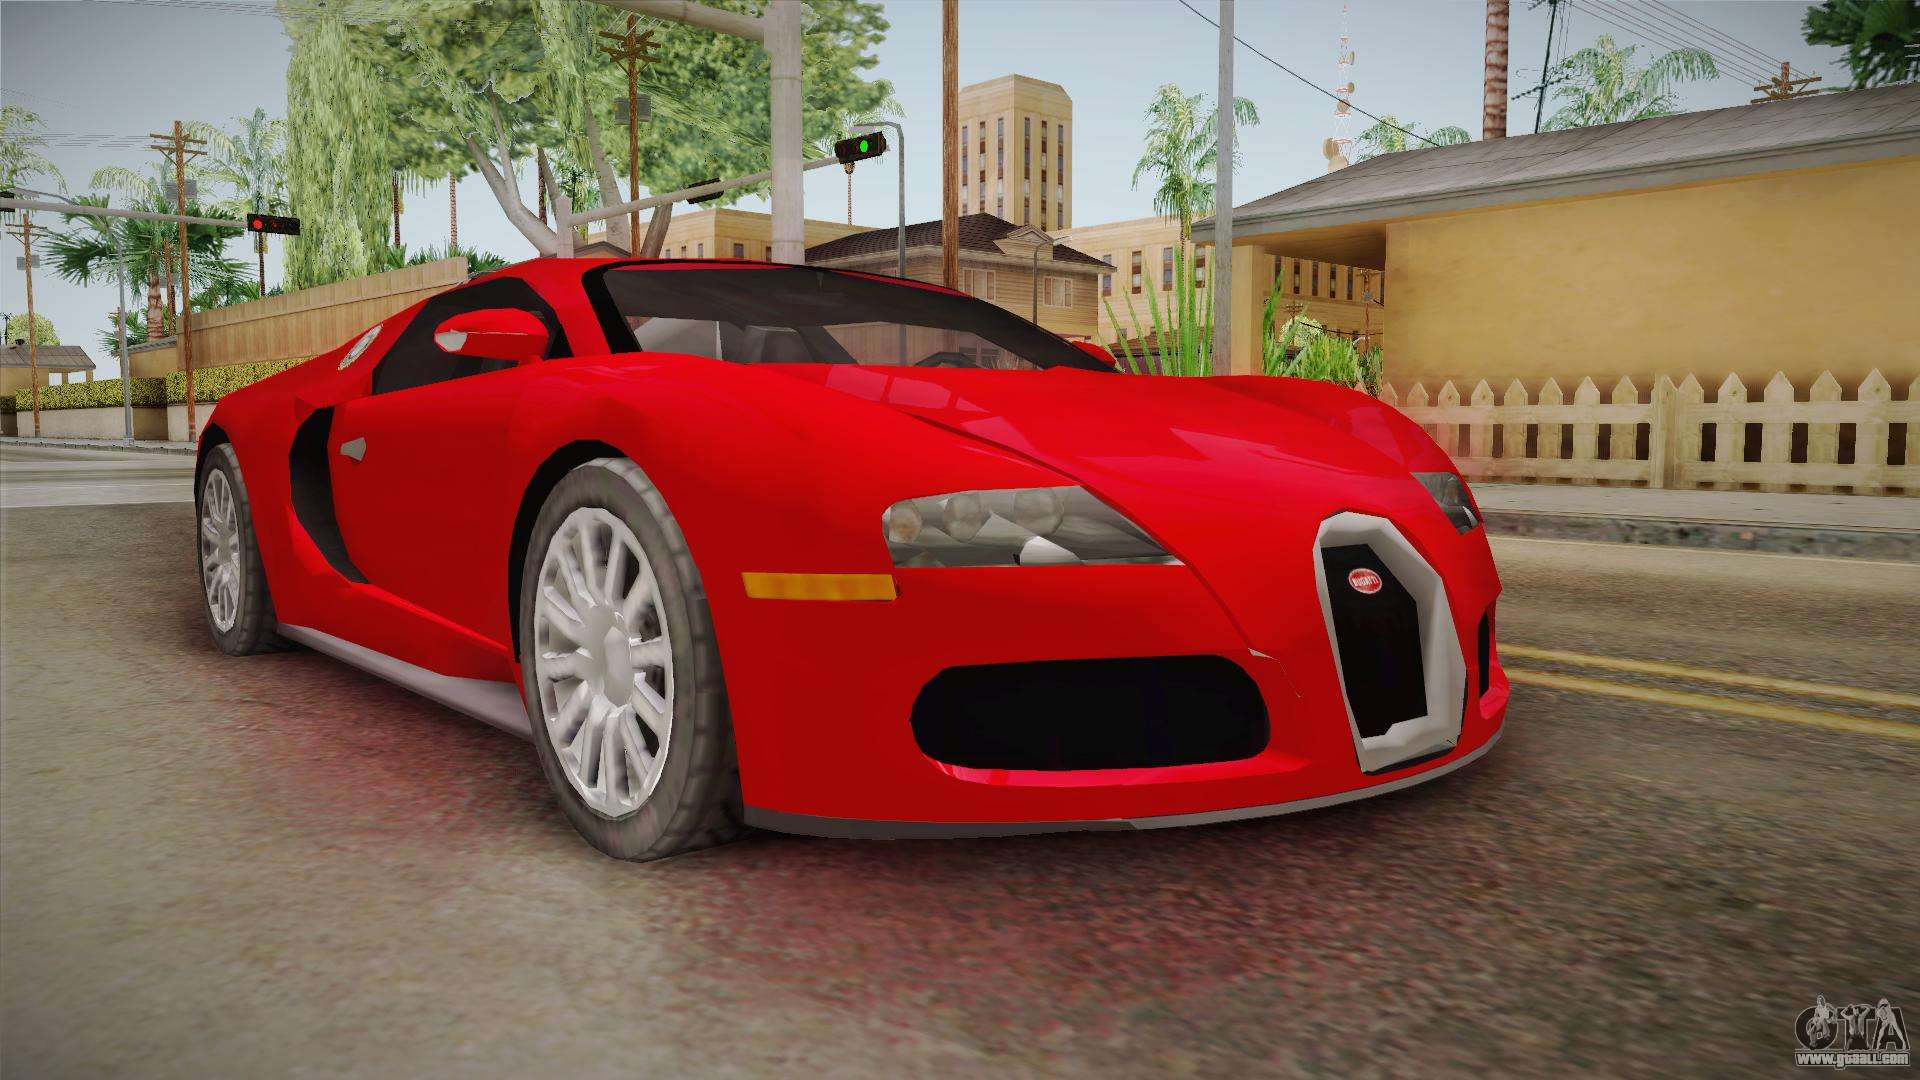 401836-gta-sa-2017-05-28-15-23-06-88 Wonderful Bugatti Veyron Xbox 360 Games Cars Trend